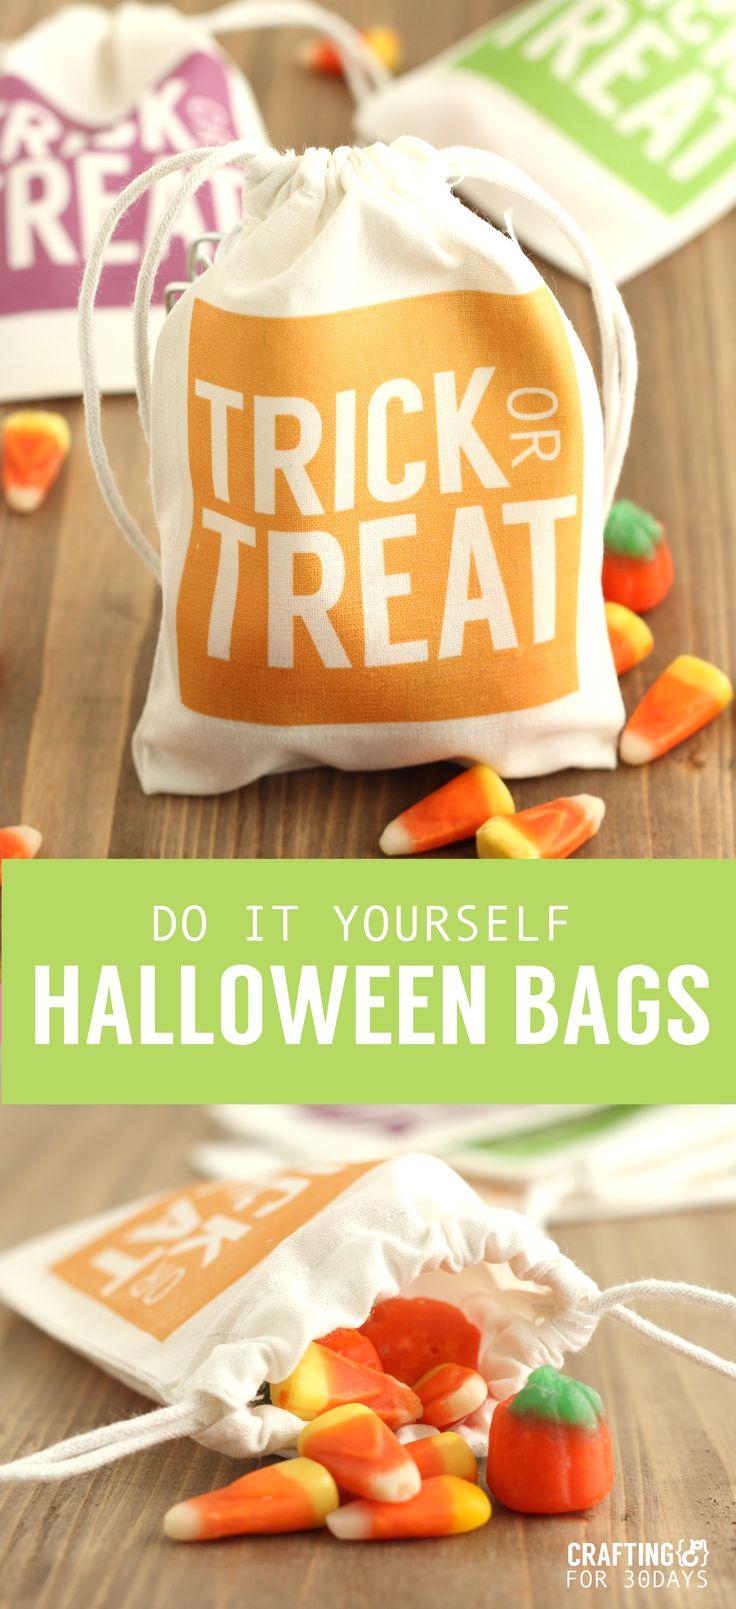 Best 25+ Halloween bags ideas on Pinterest | Halloween goodie bags ...